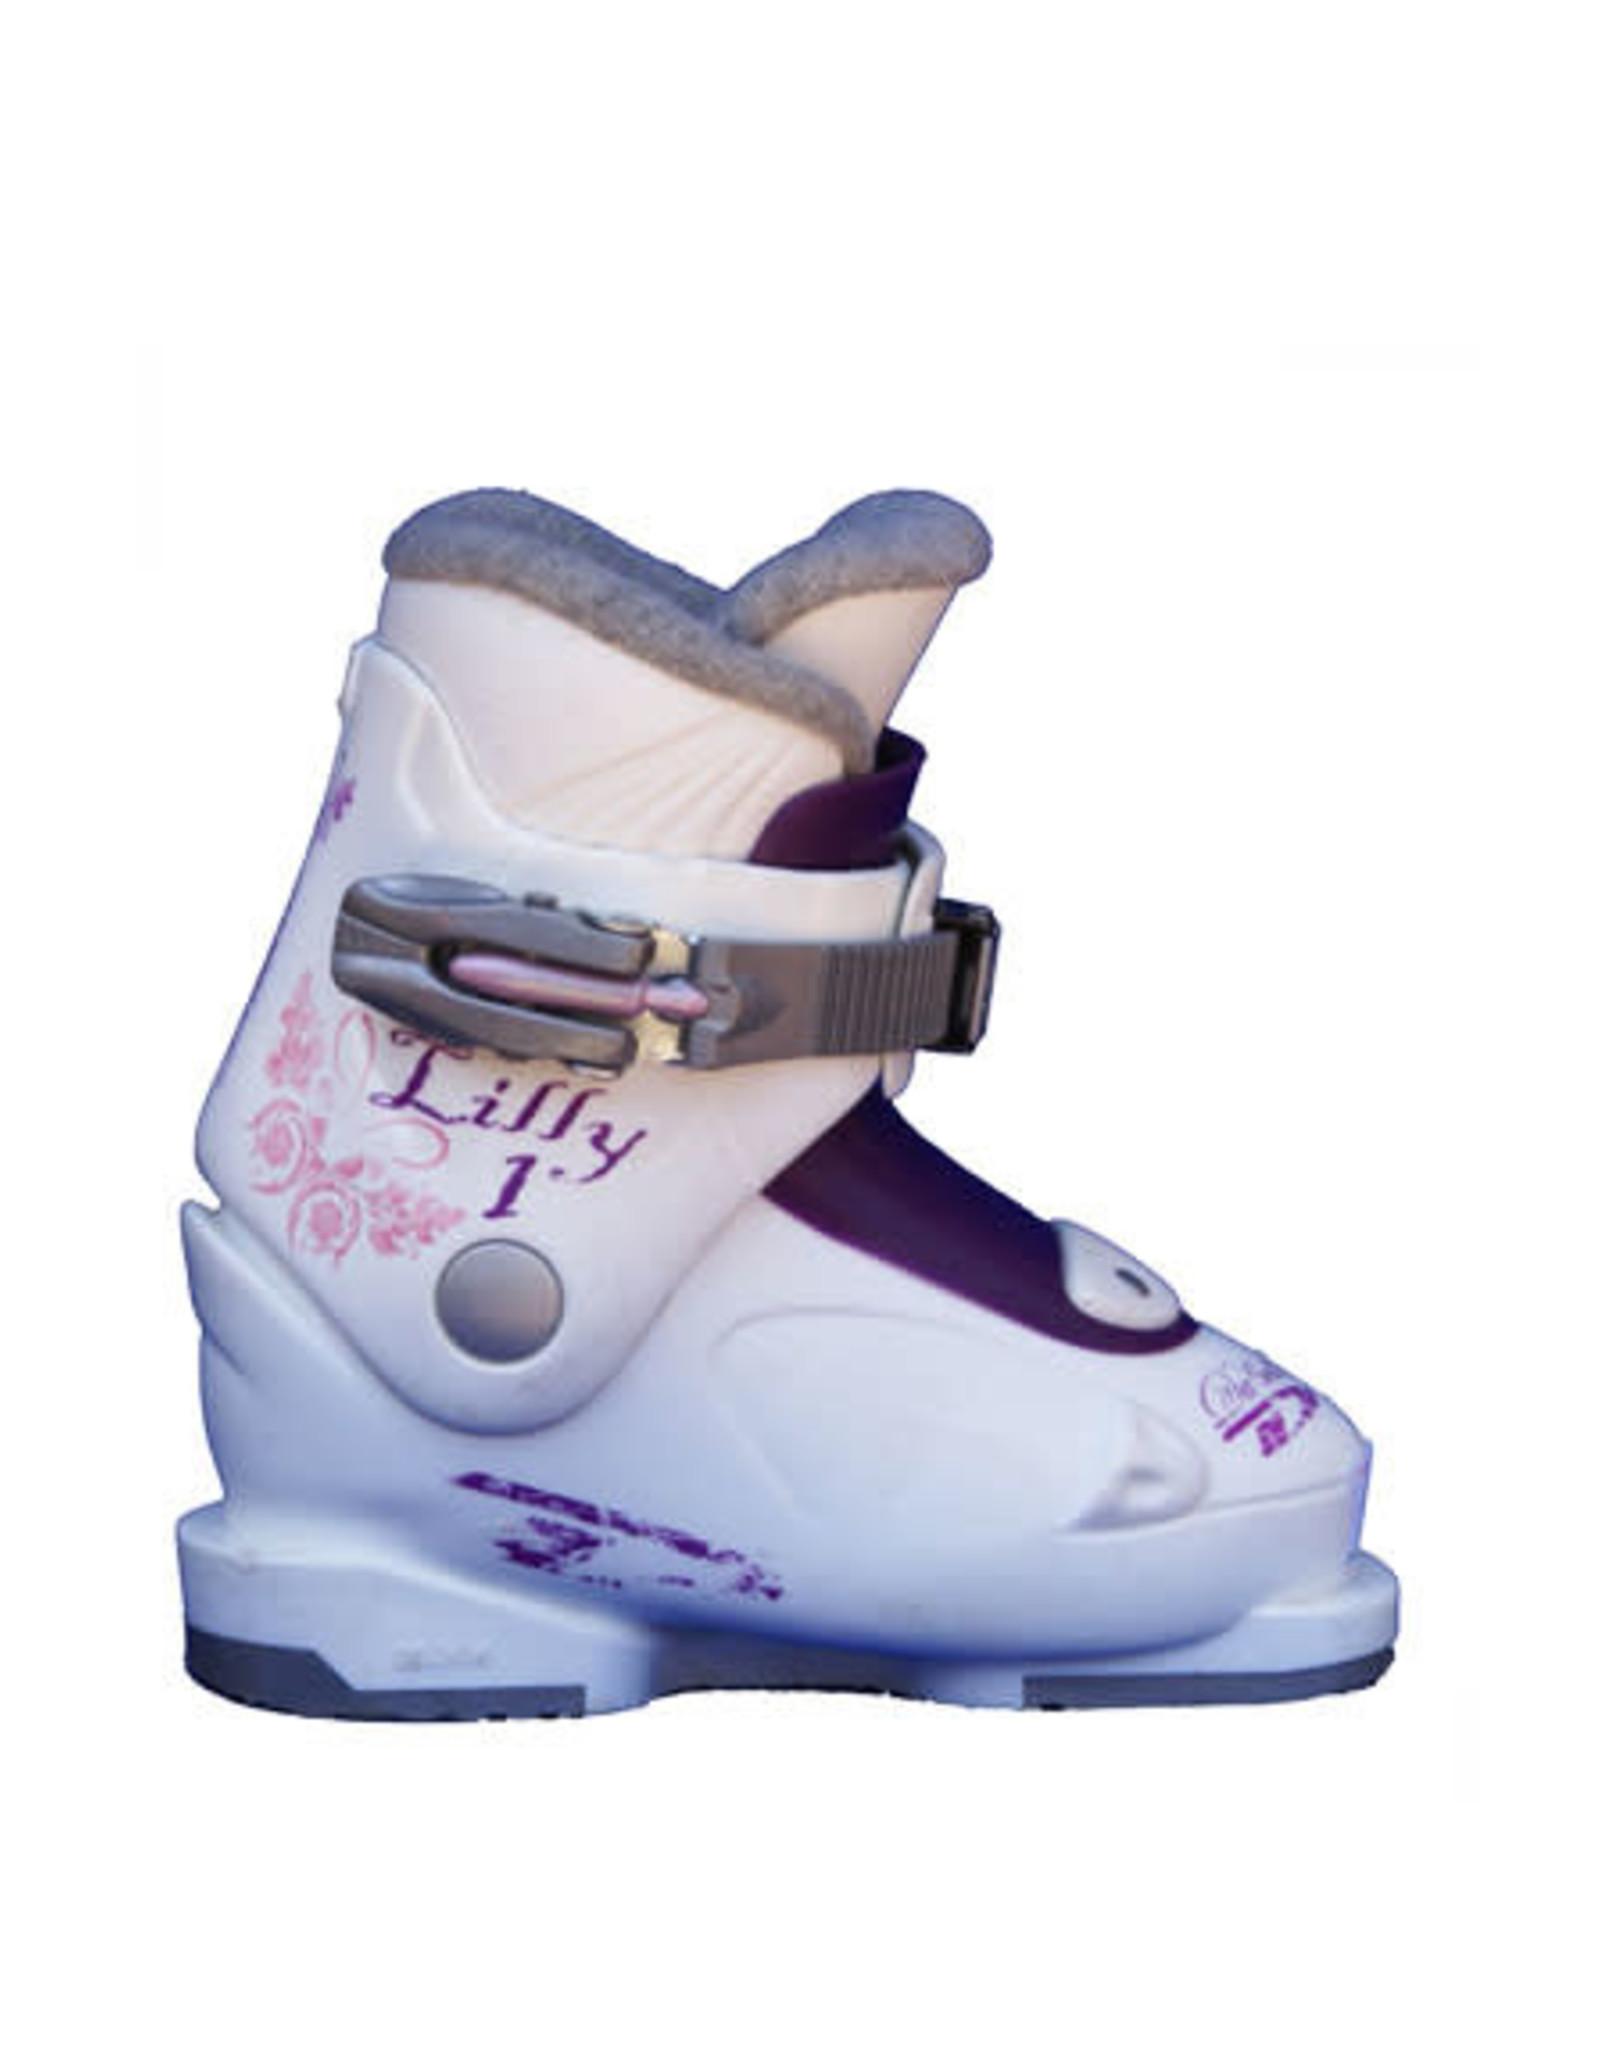 DALBELLO Skischoenen DALBELLO Lilly Gebruikt